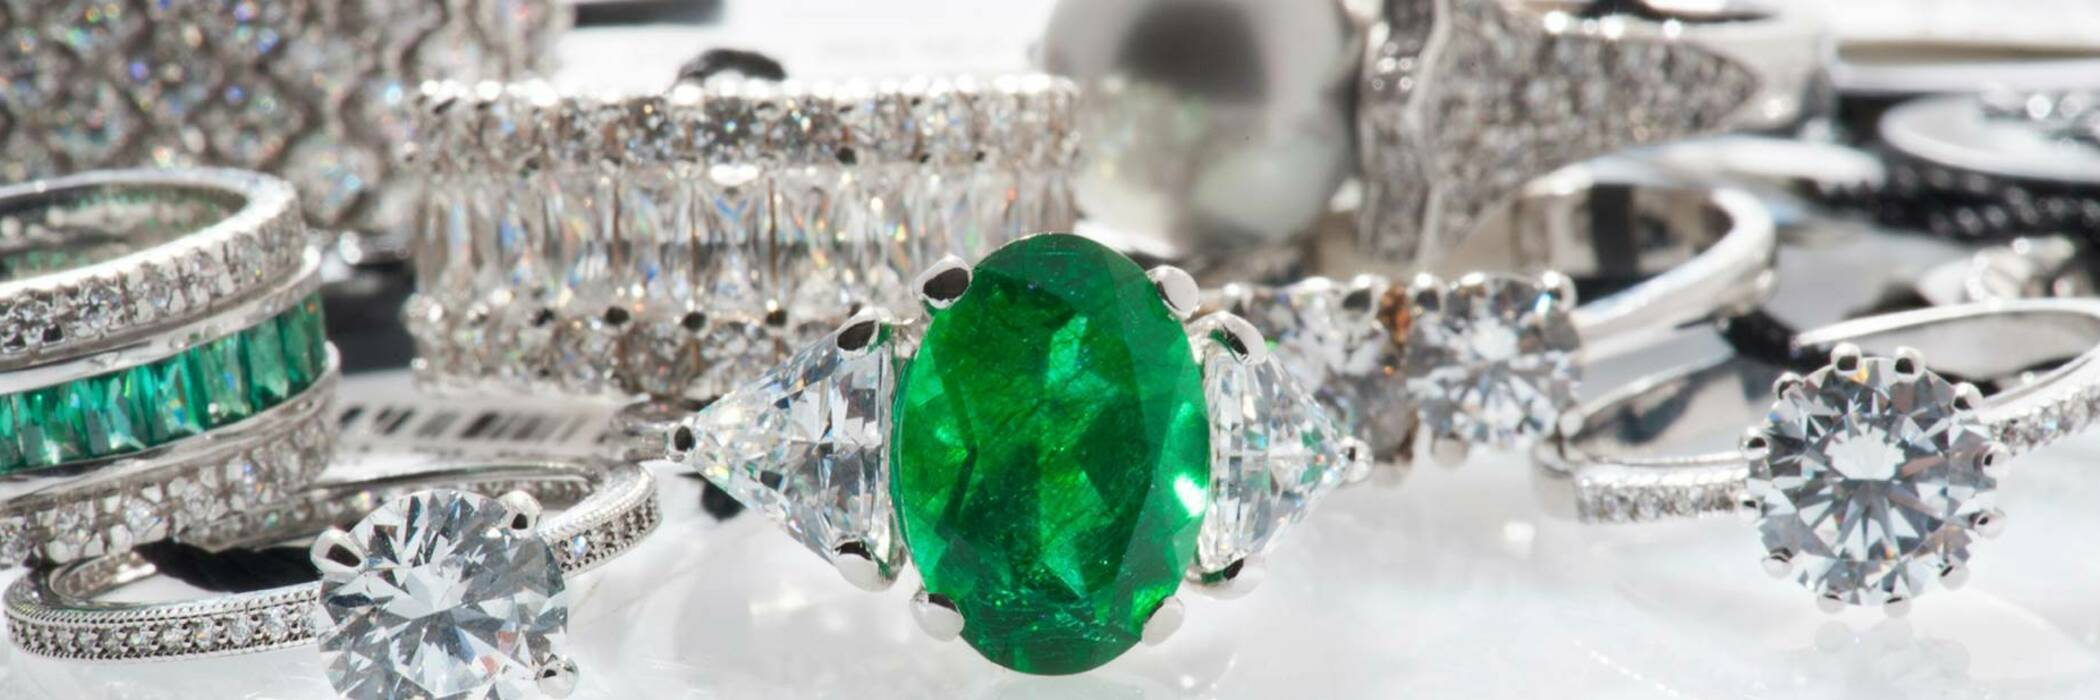 23sep jewellery insurance hero